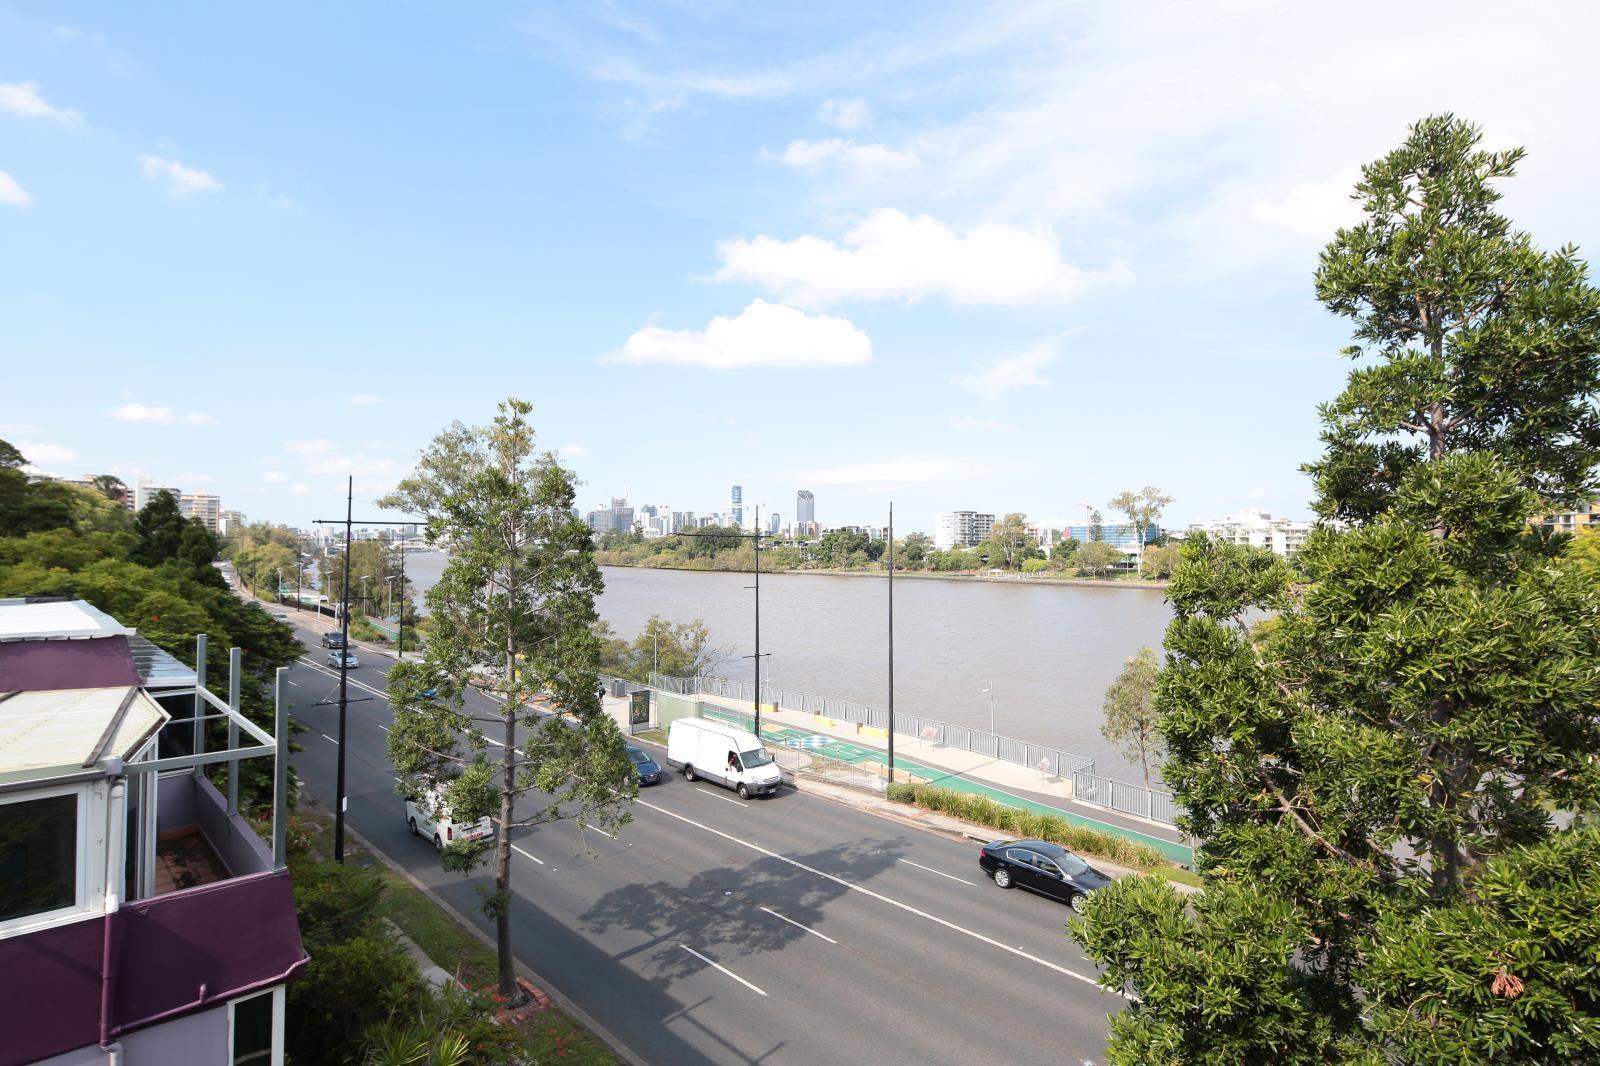 17/12 Patrick Lane, Toowong QLD 4066, Image 0